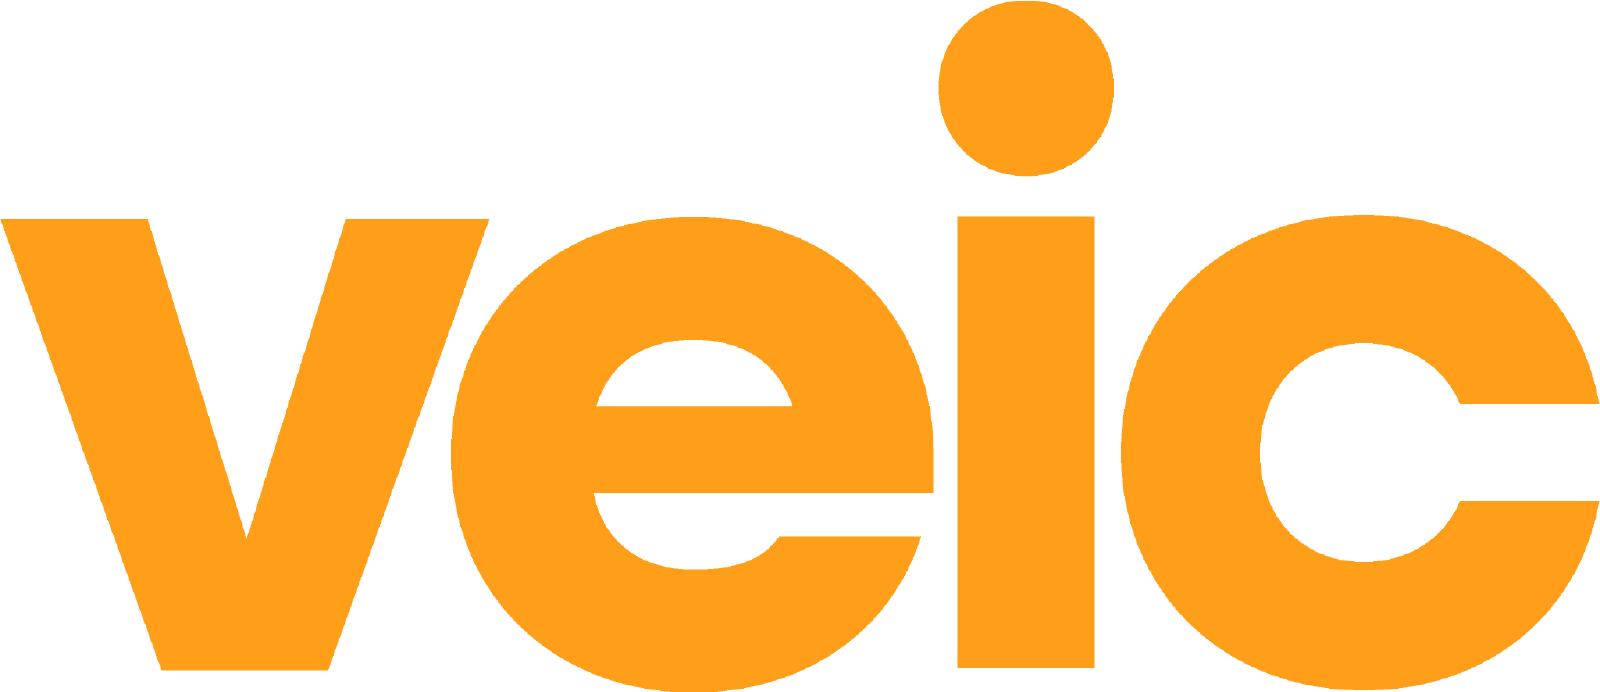 VEIC_orange_RGB_1600w